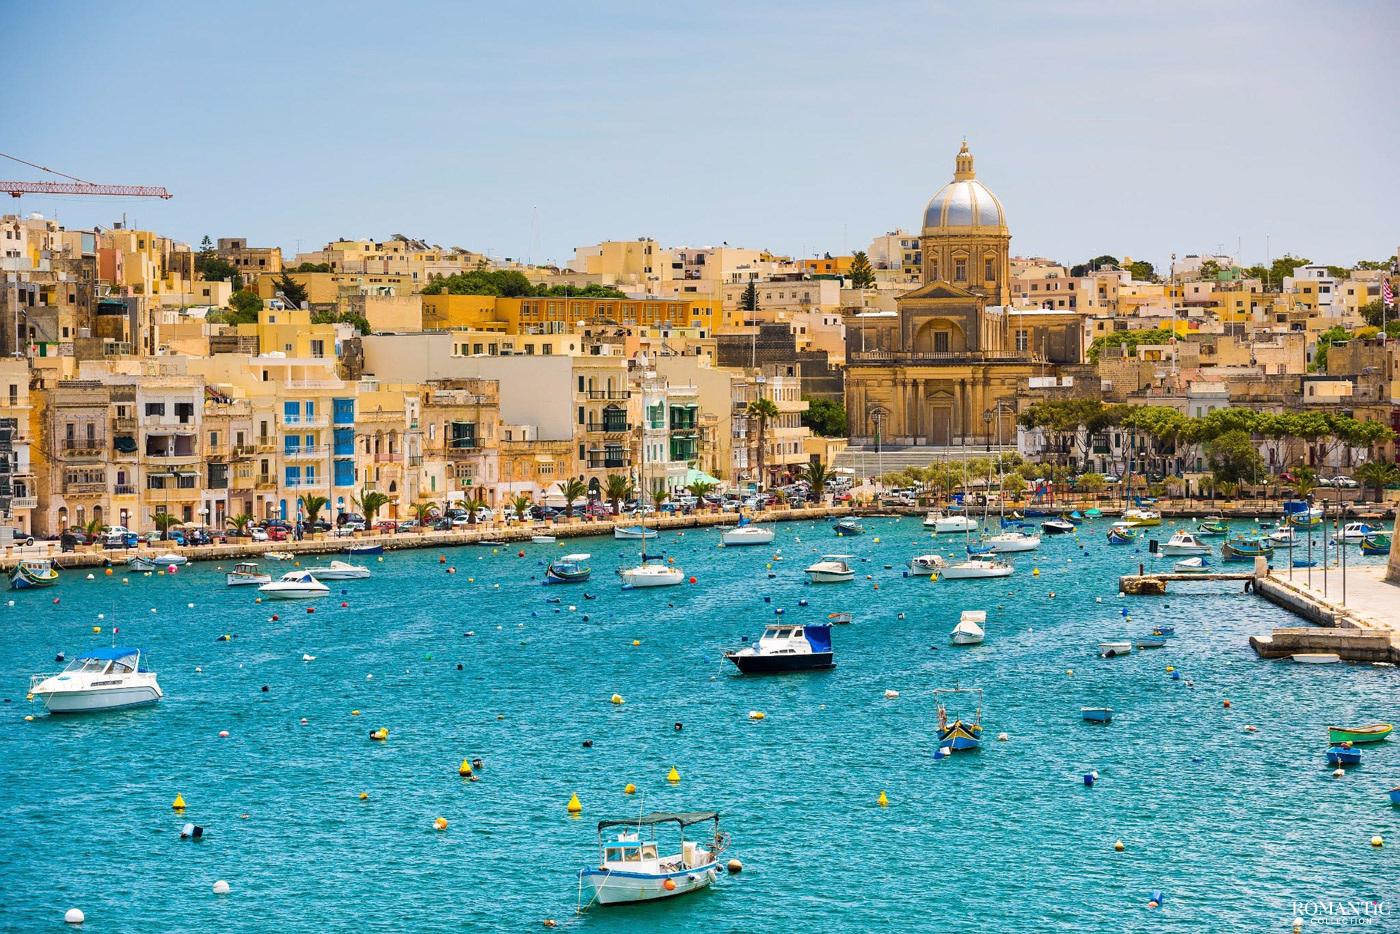 Валетта, столица Мальты